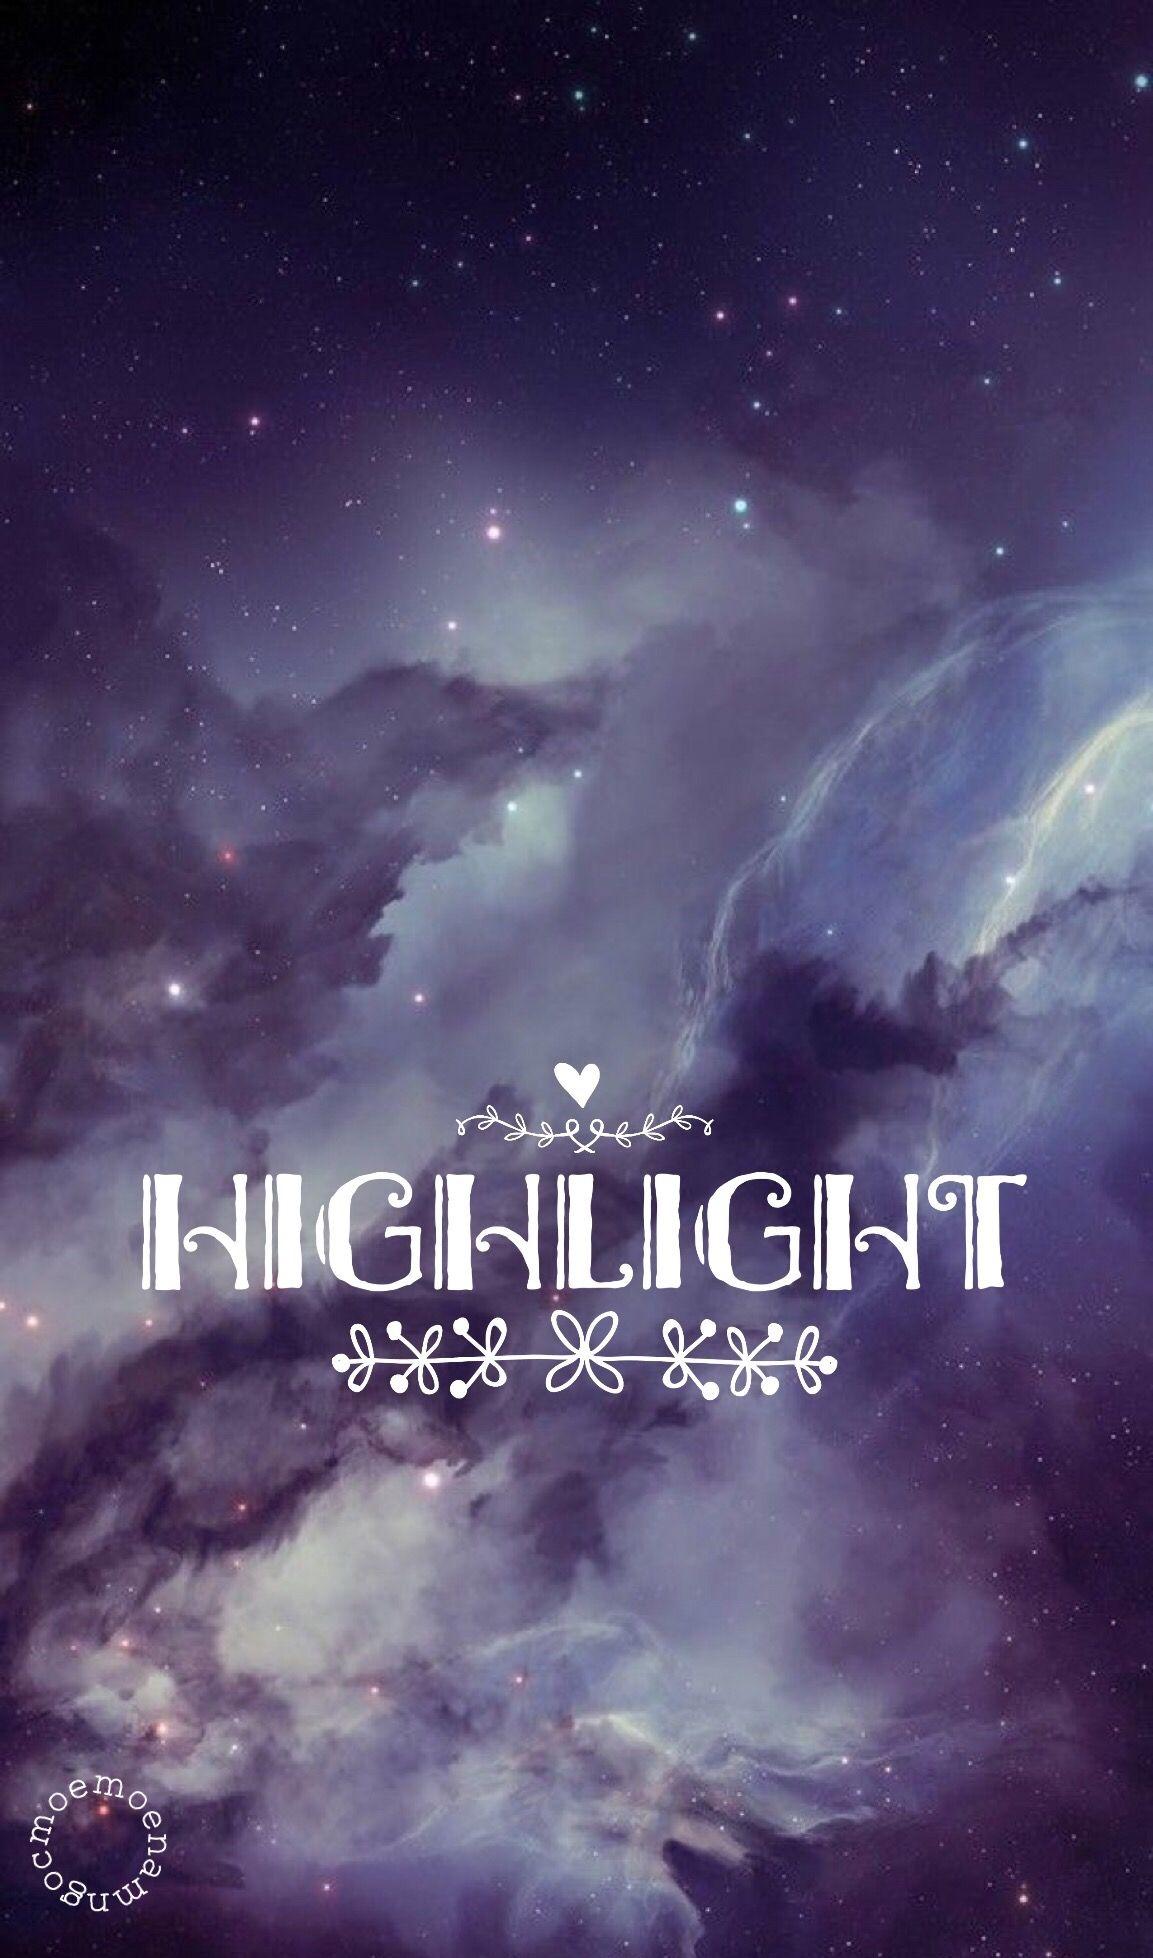 Free download Hightlight Kpop Iphone Wallpaper Galaxy